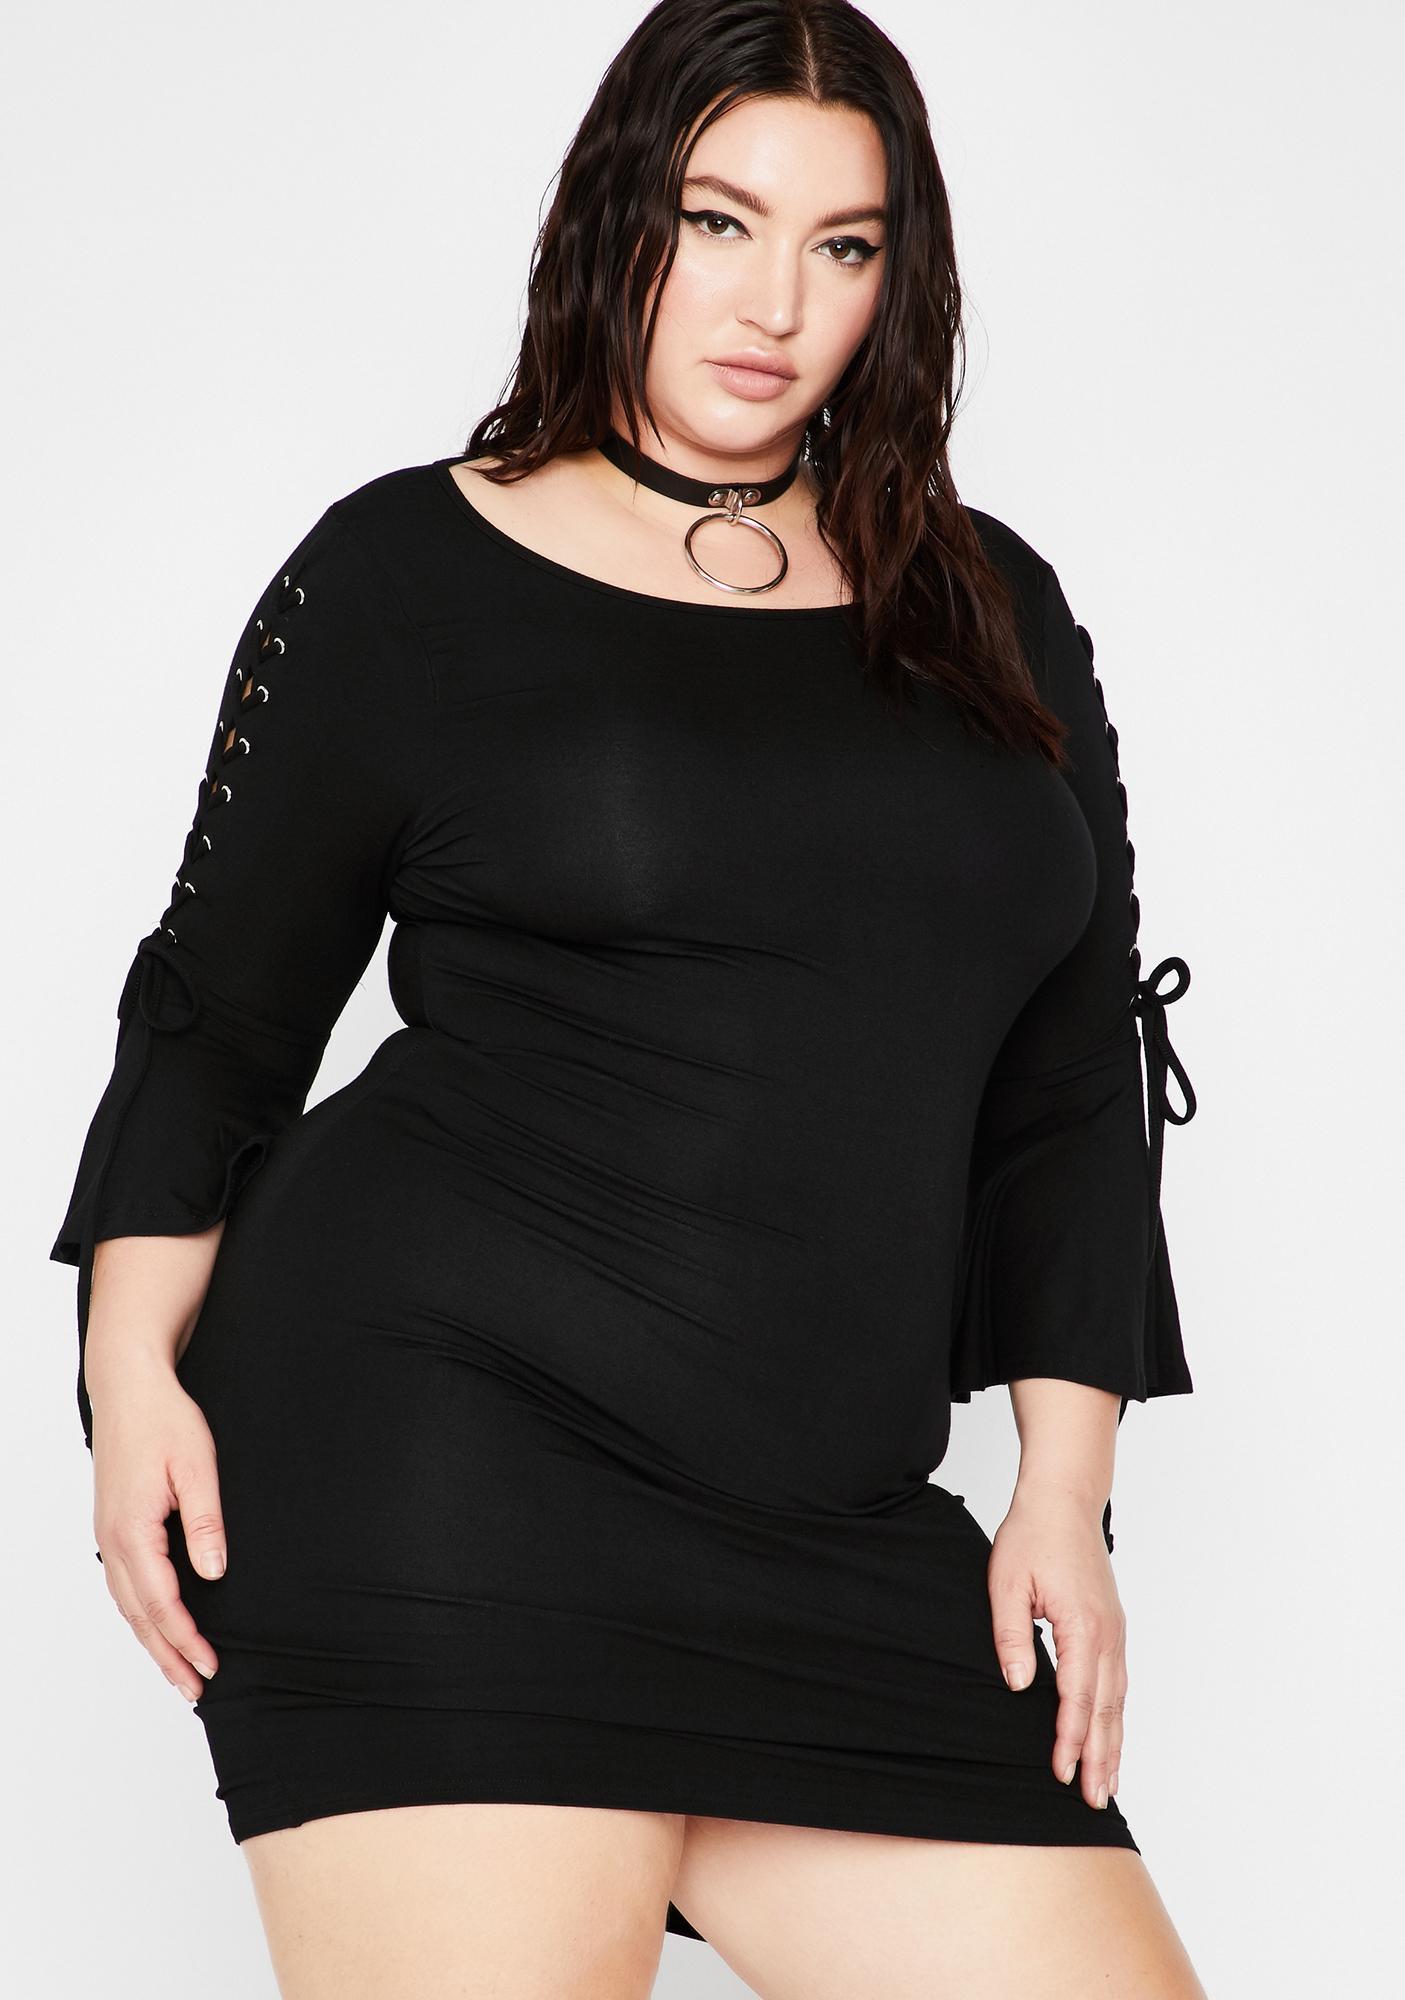 Bewitched Bish Mini Dress